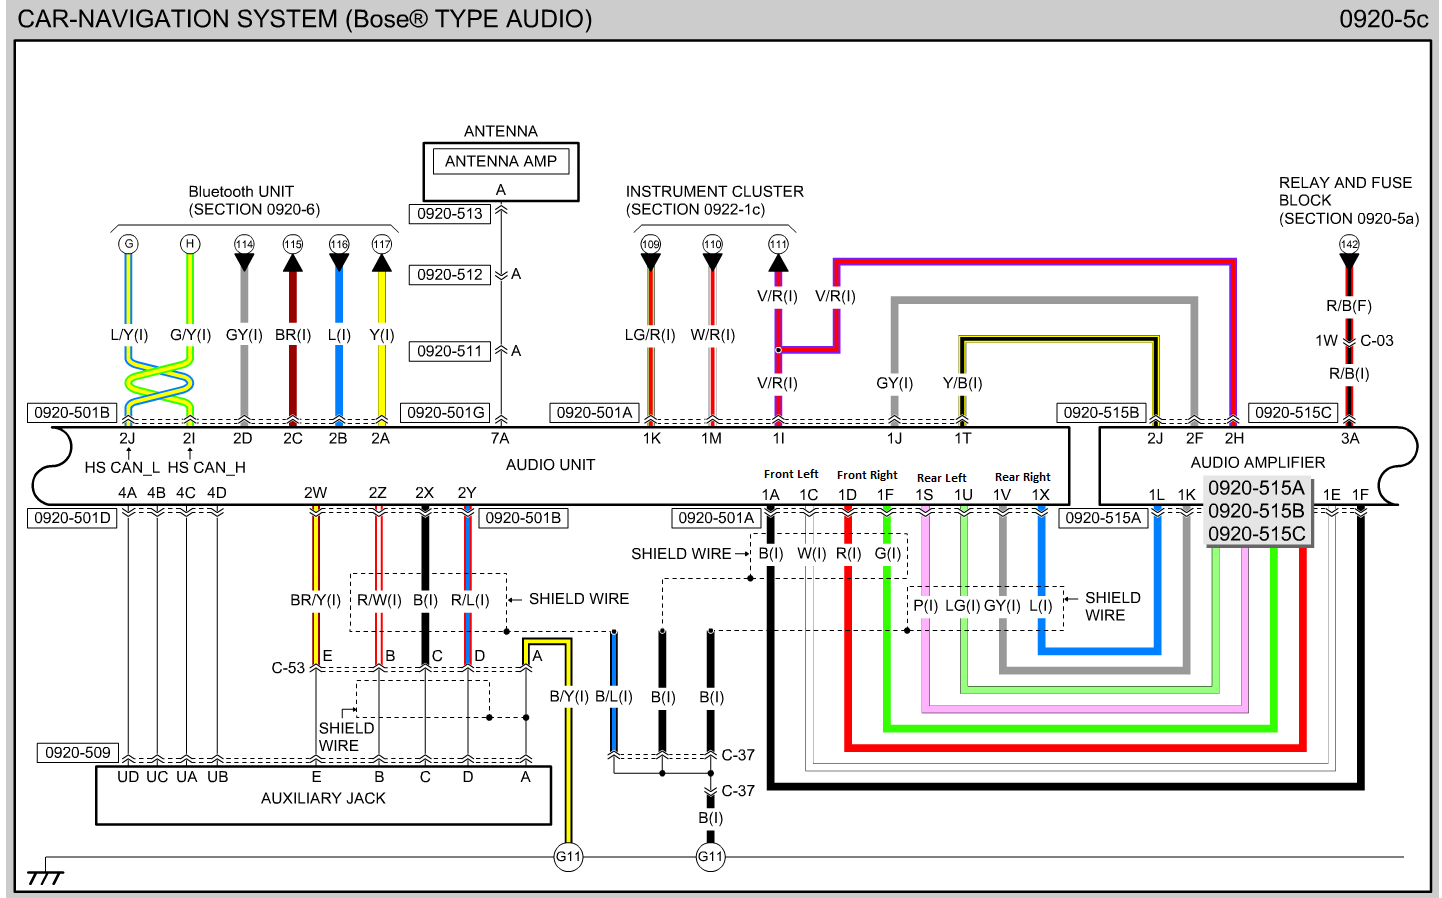 Diagram In Pictures Database Mazda Cx 7 2010 Wiring Diagram Just Download Or Read Wiring Diagram Online Casalamm Edu Mx